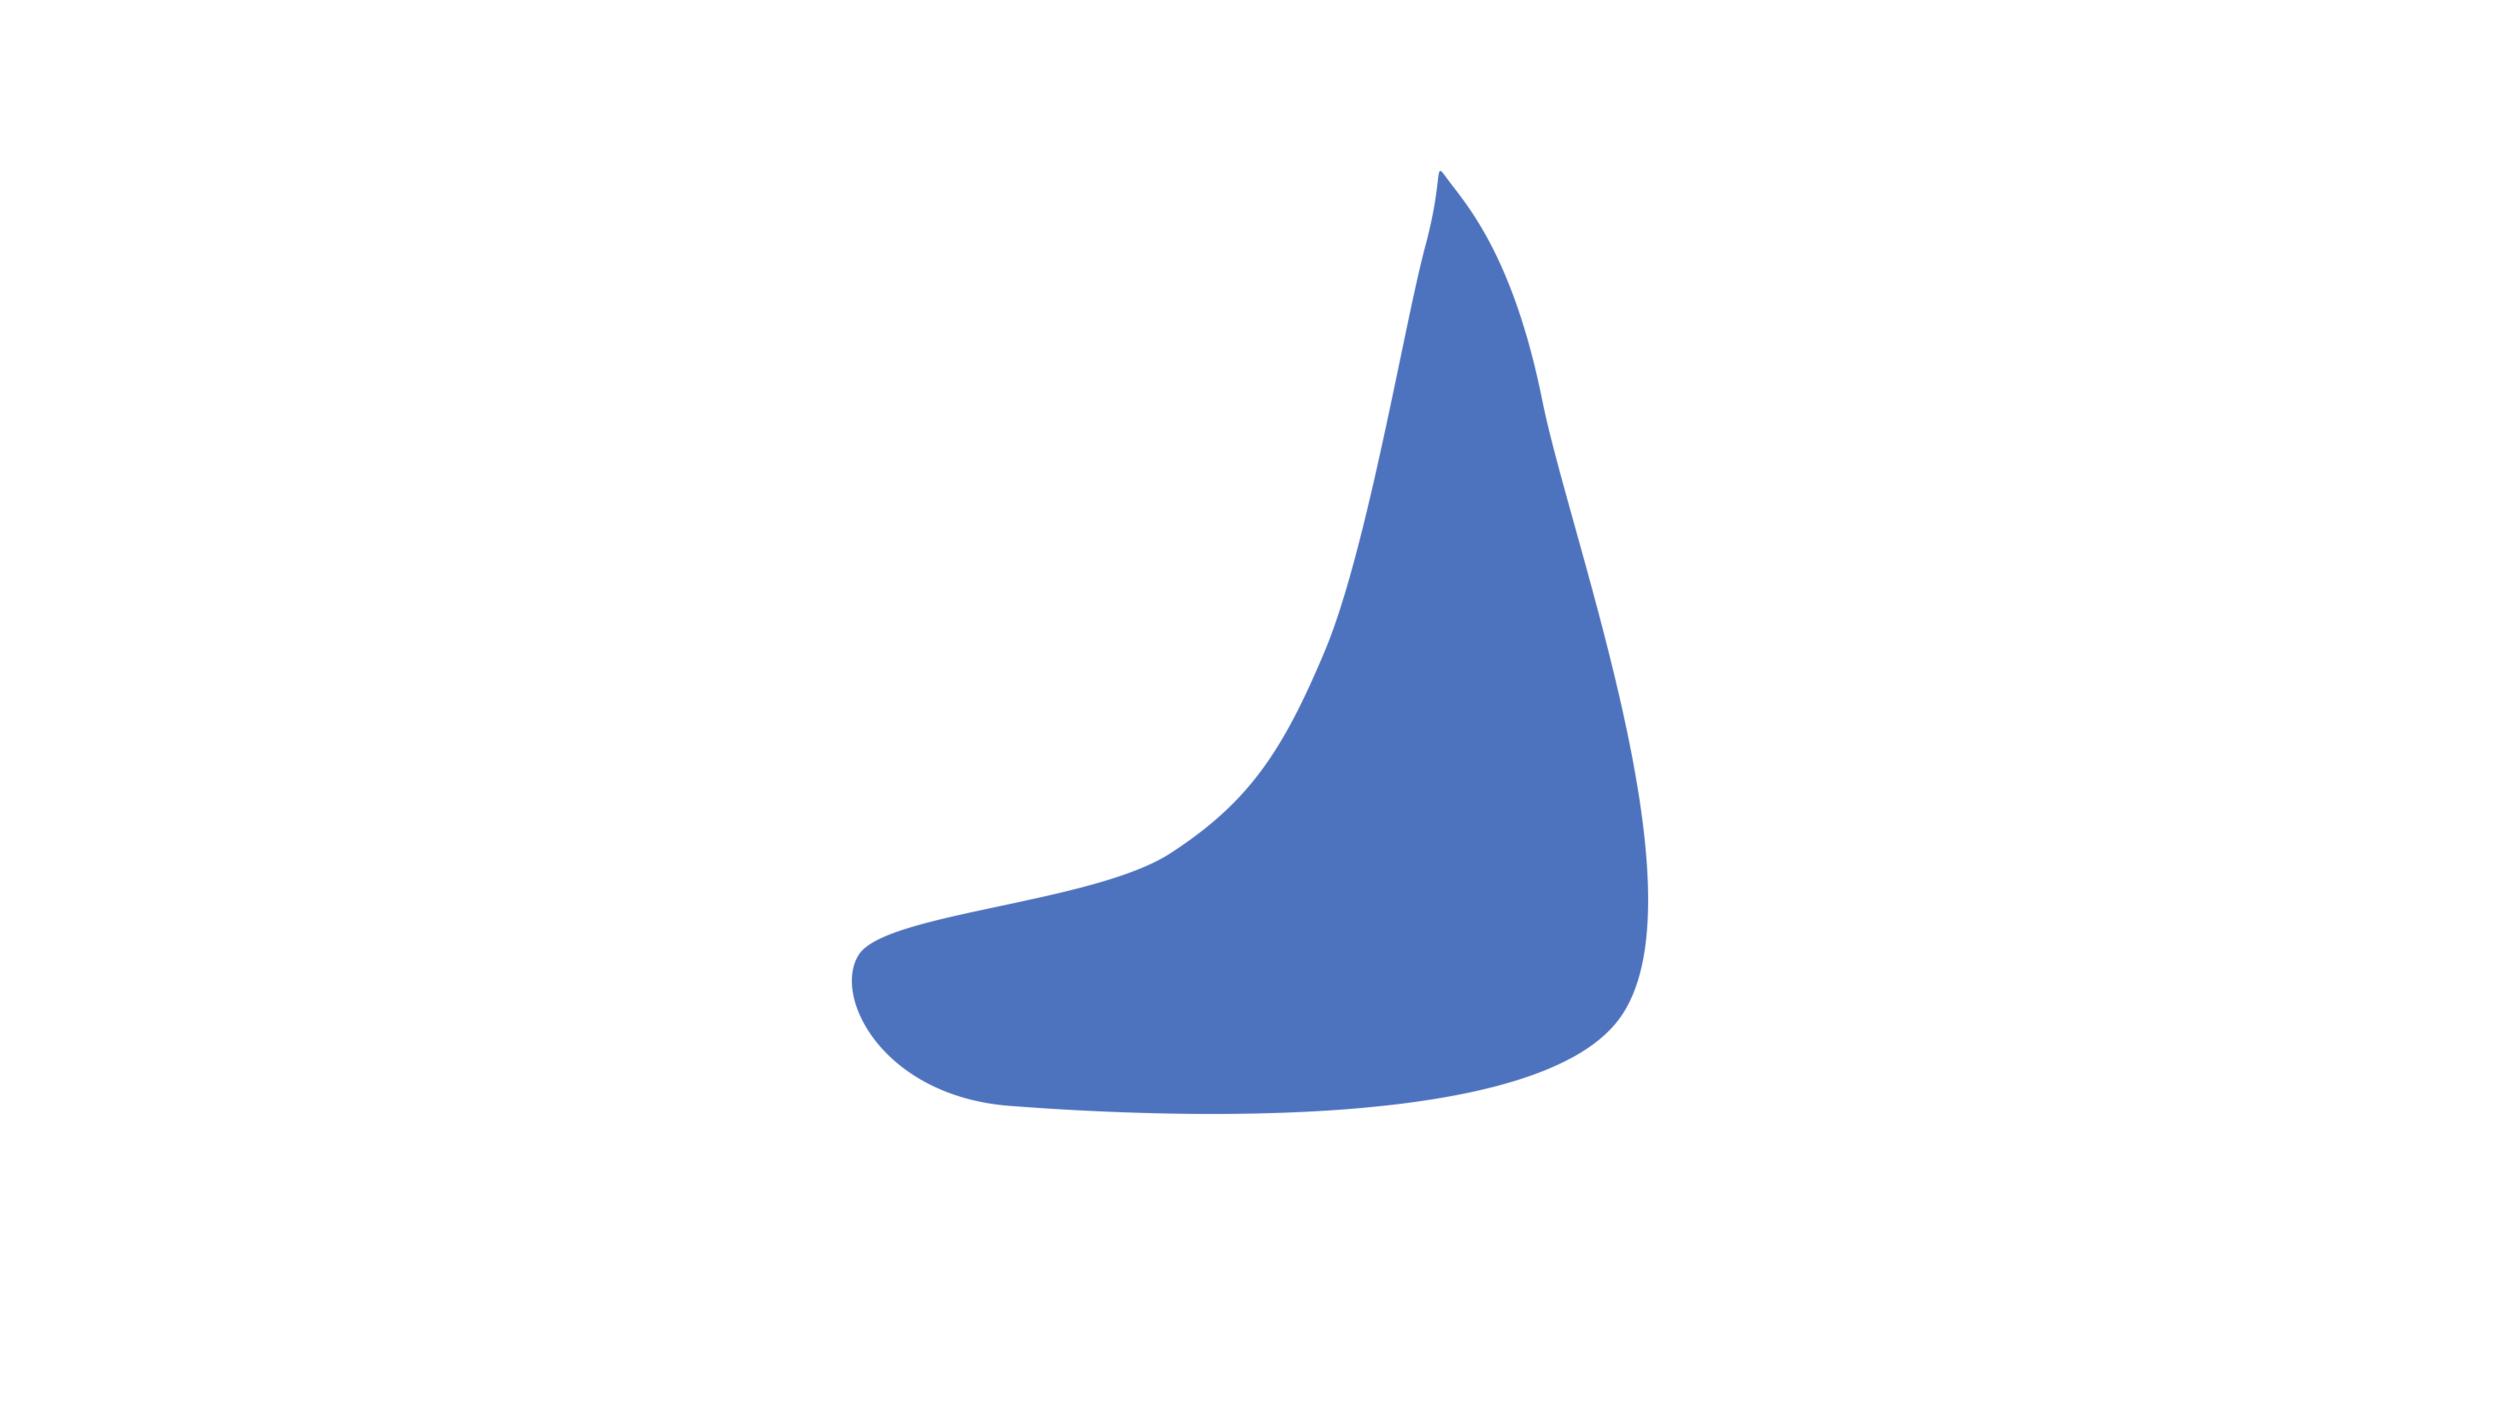 Draw a shape